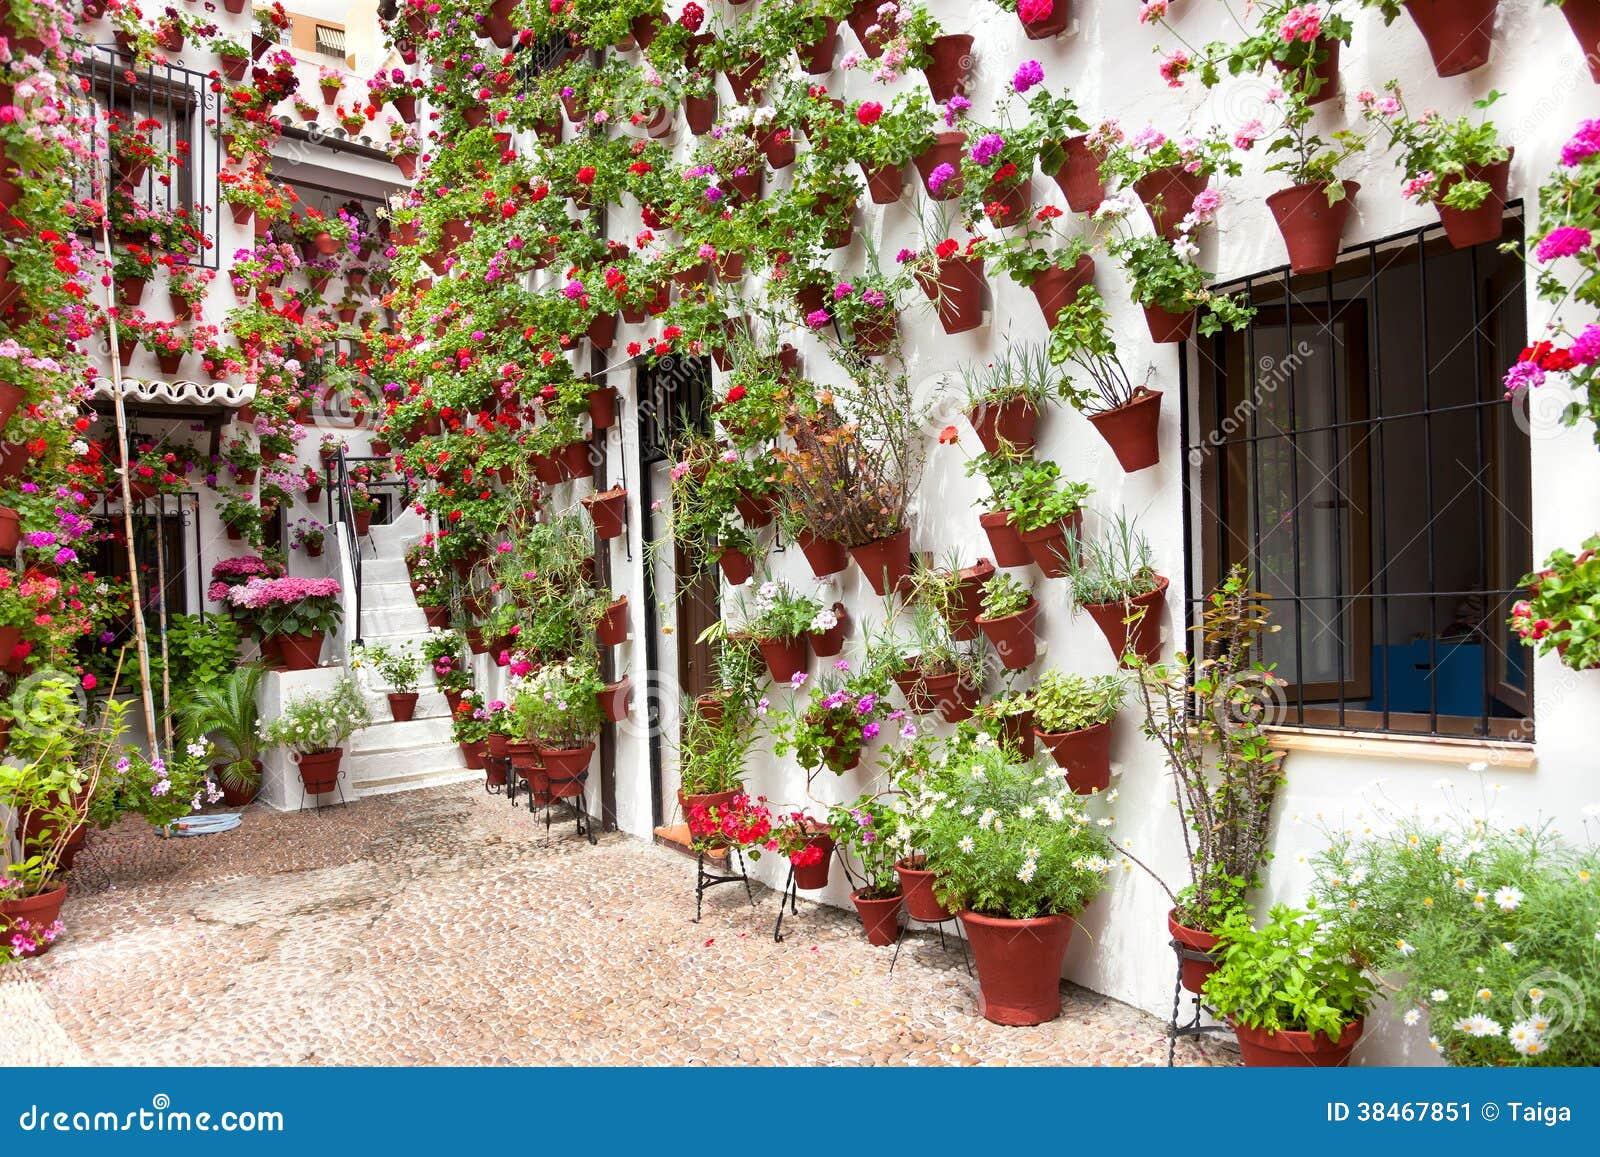 Fr hling bl ht dekoration des alten haus patios cordoba for Dekoration spanien